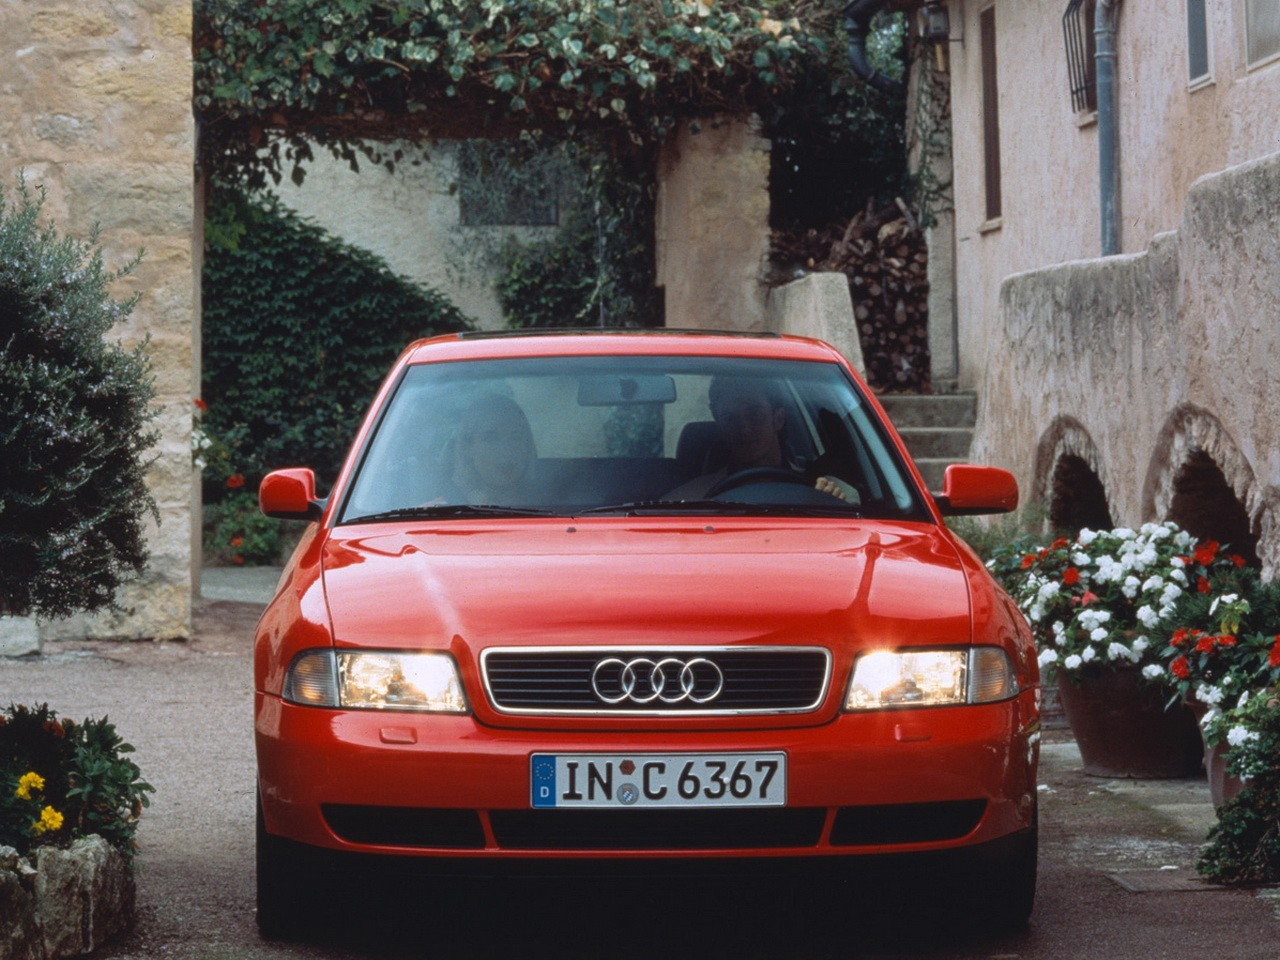 98 audi a4 manual data wiring diagrams u2022 rh naopak co 1998 Audi A4 Interior Audi A4 B5